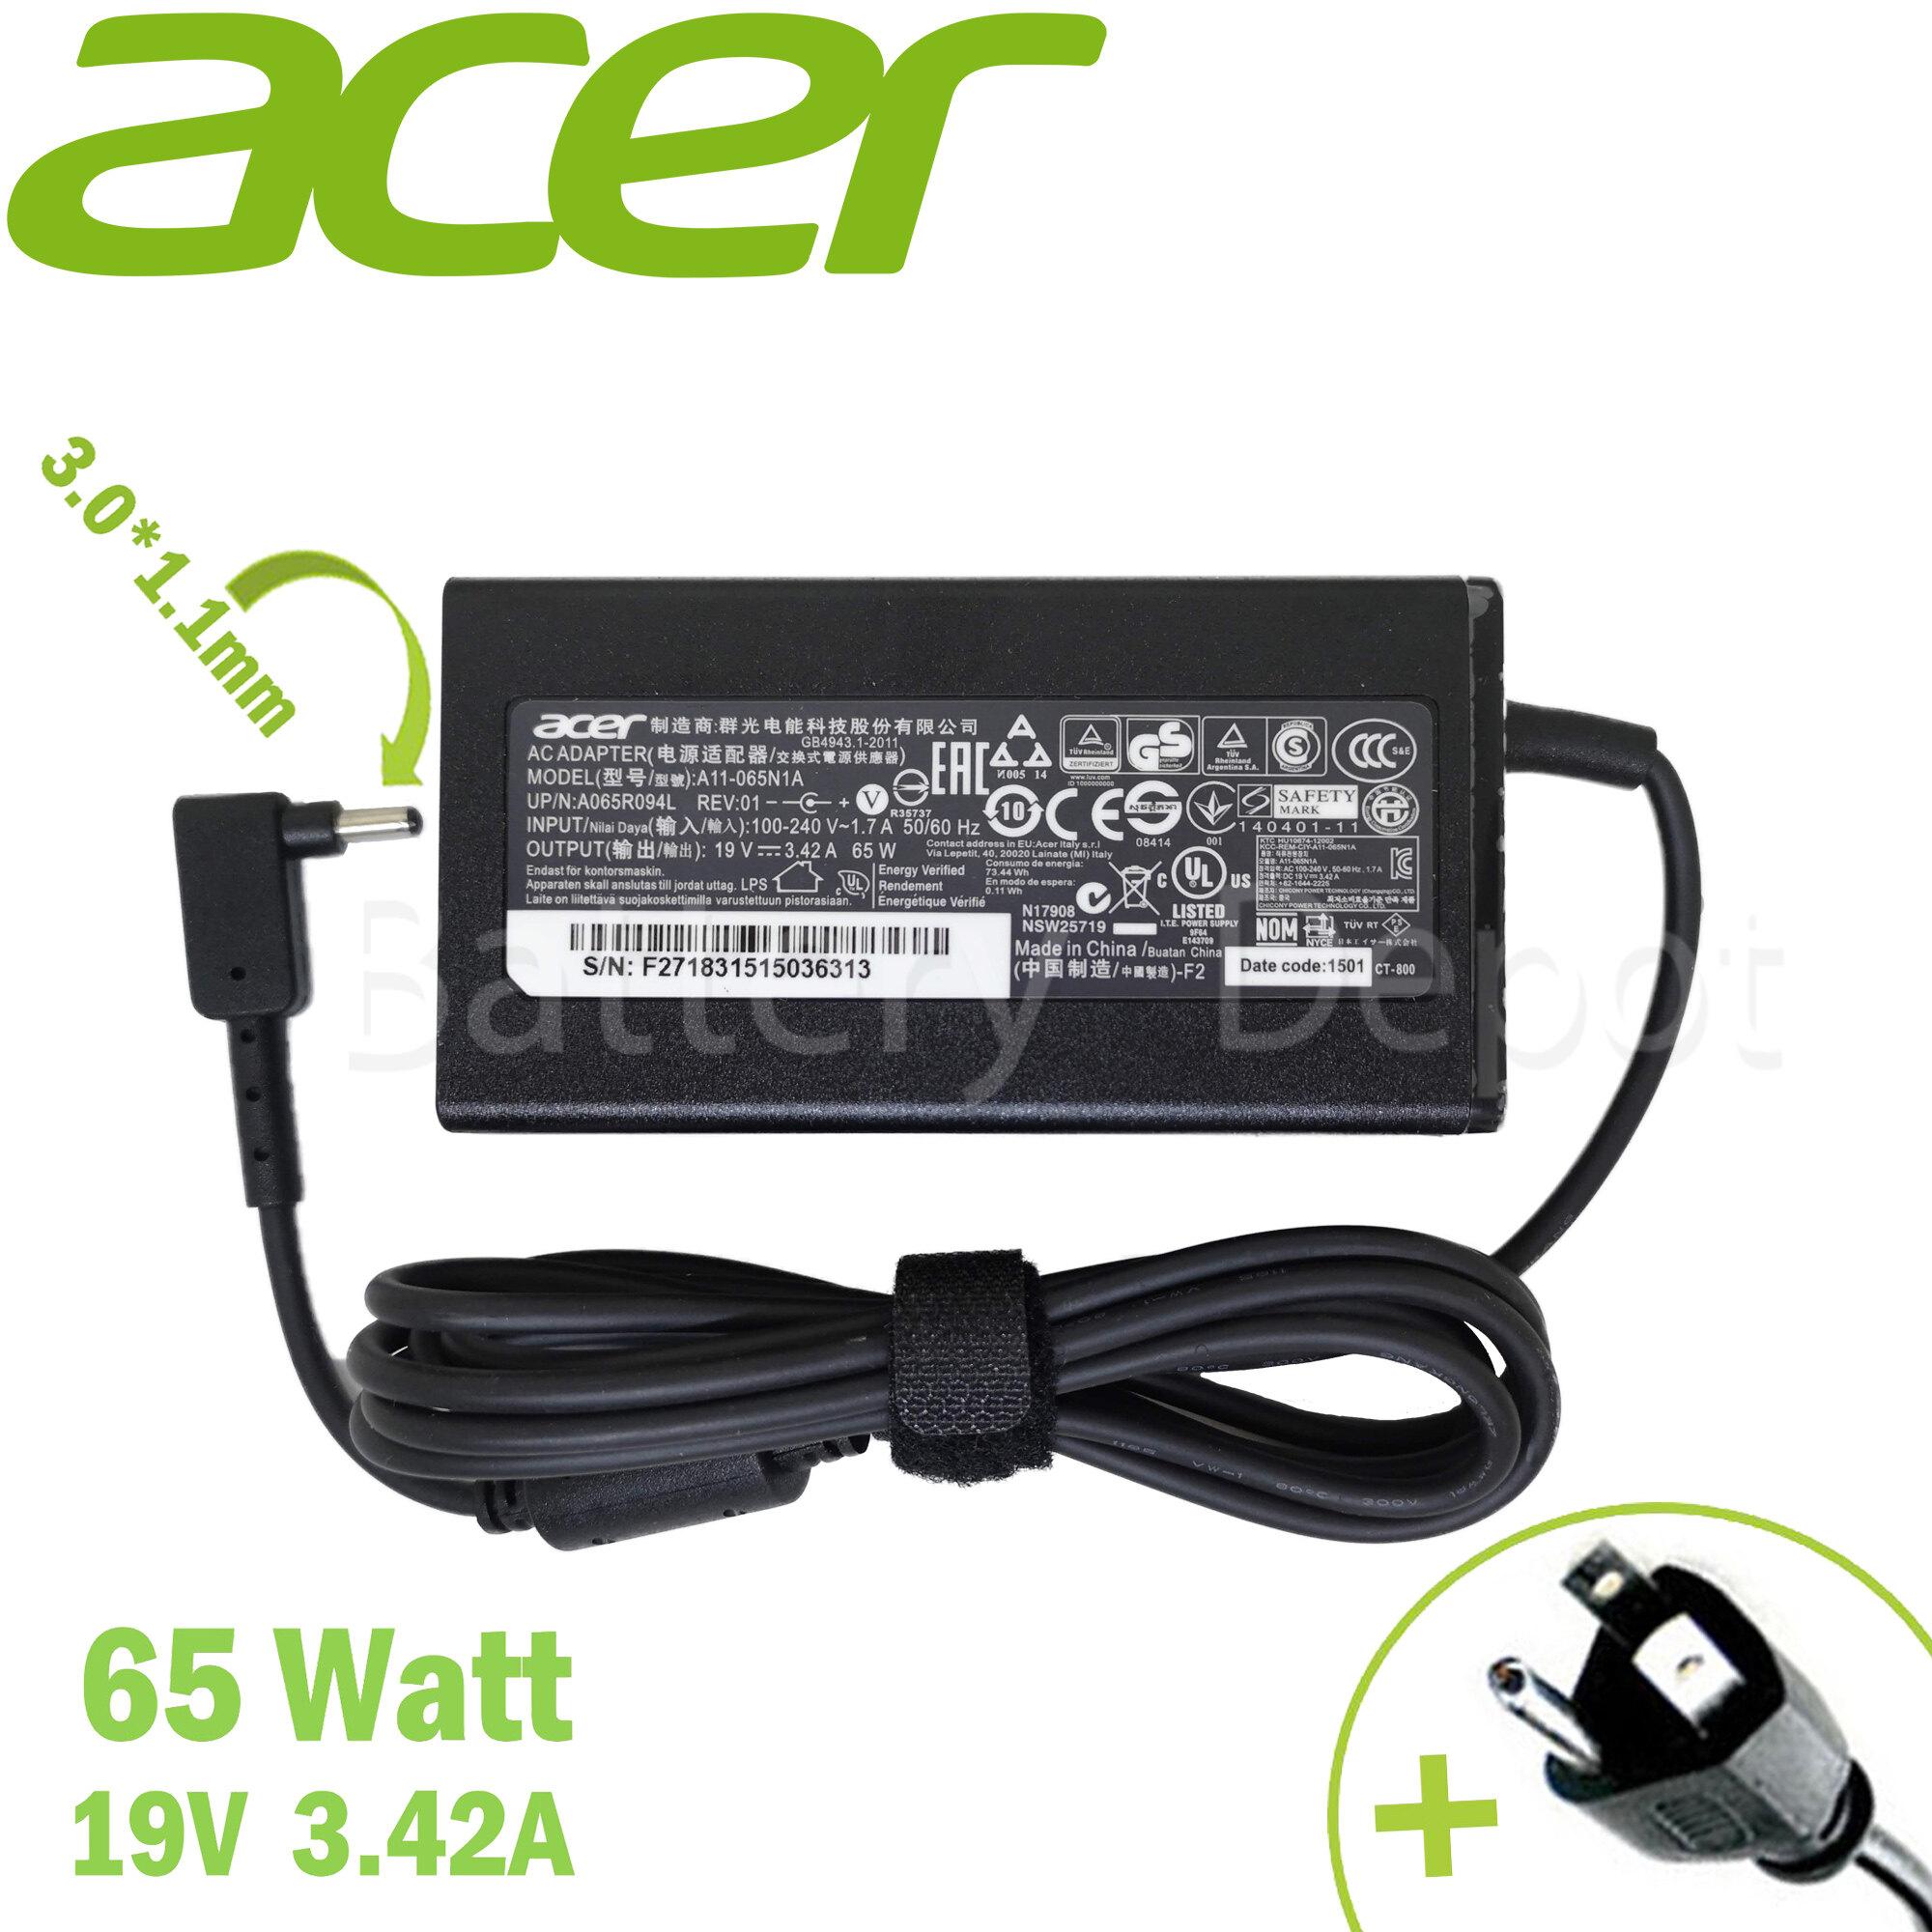 Acer Adapter ของแท้ 19v/3.42a 65w หัวขนาด 3.0*1.1mm สายชาร์จ อะแดปเตอร์.